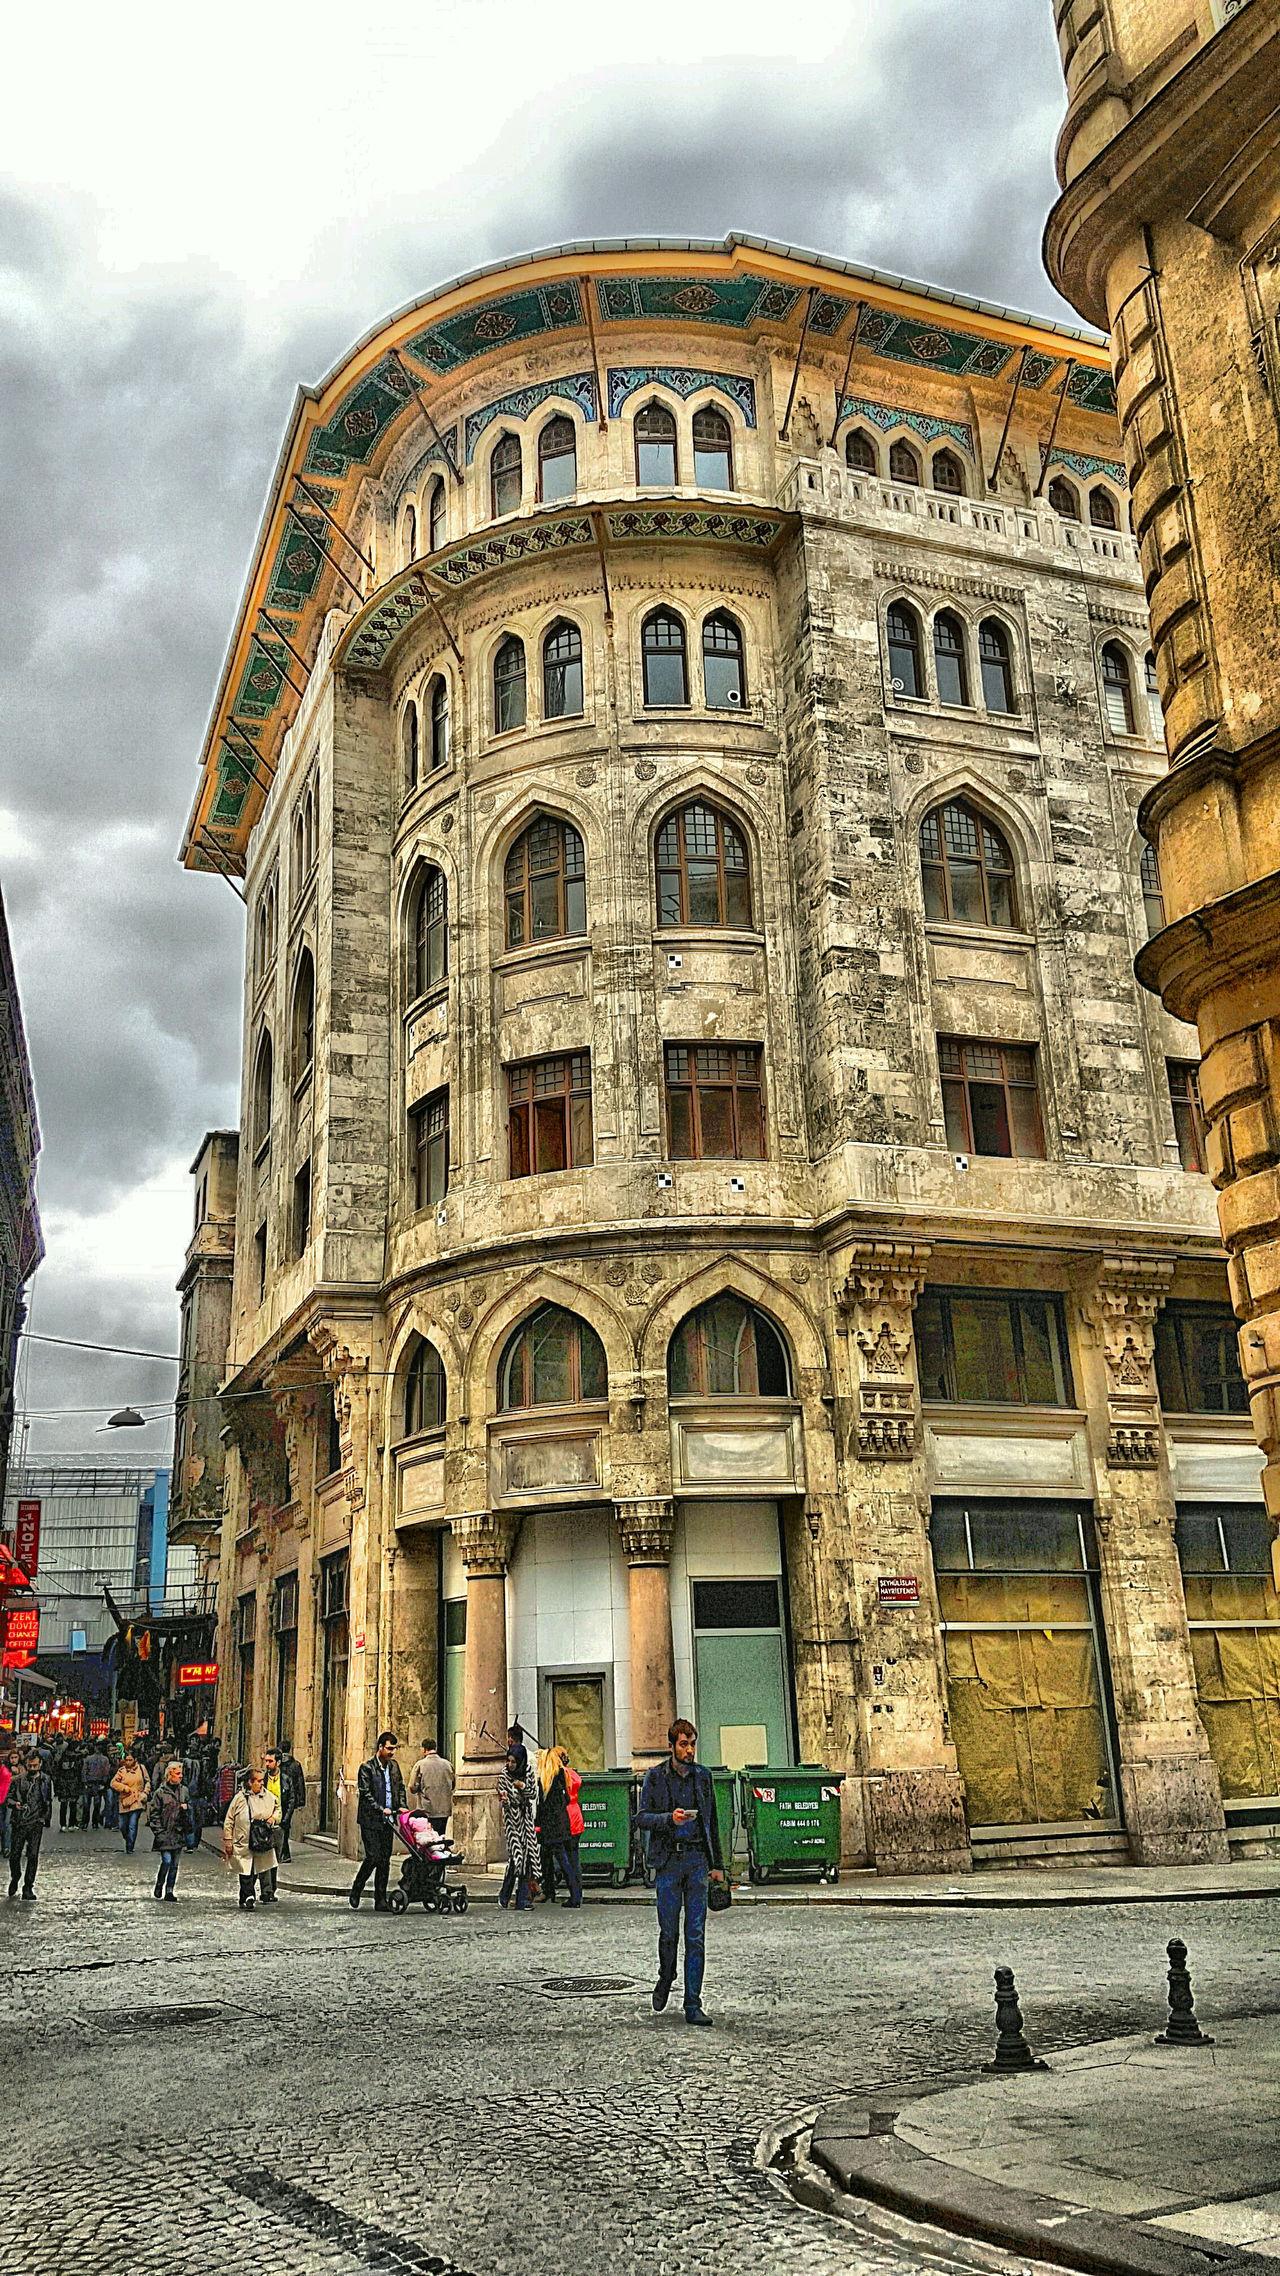 Eminönü/ İstanbul Travel Destinations Architecture Building Exterior Historical Place Historical HDRphoto Hdrpics Hdrphotography City Hdrcreators Streetphotography